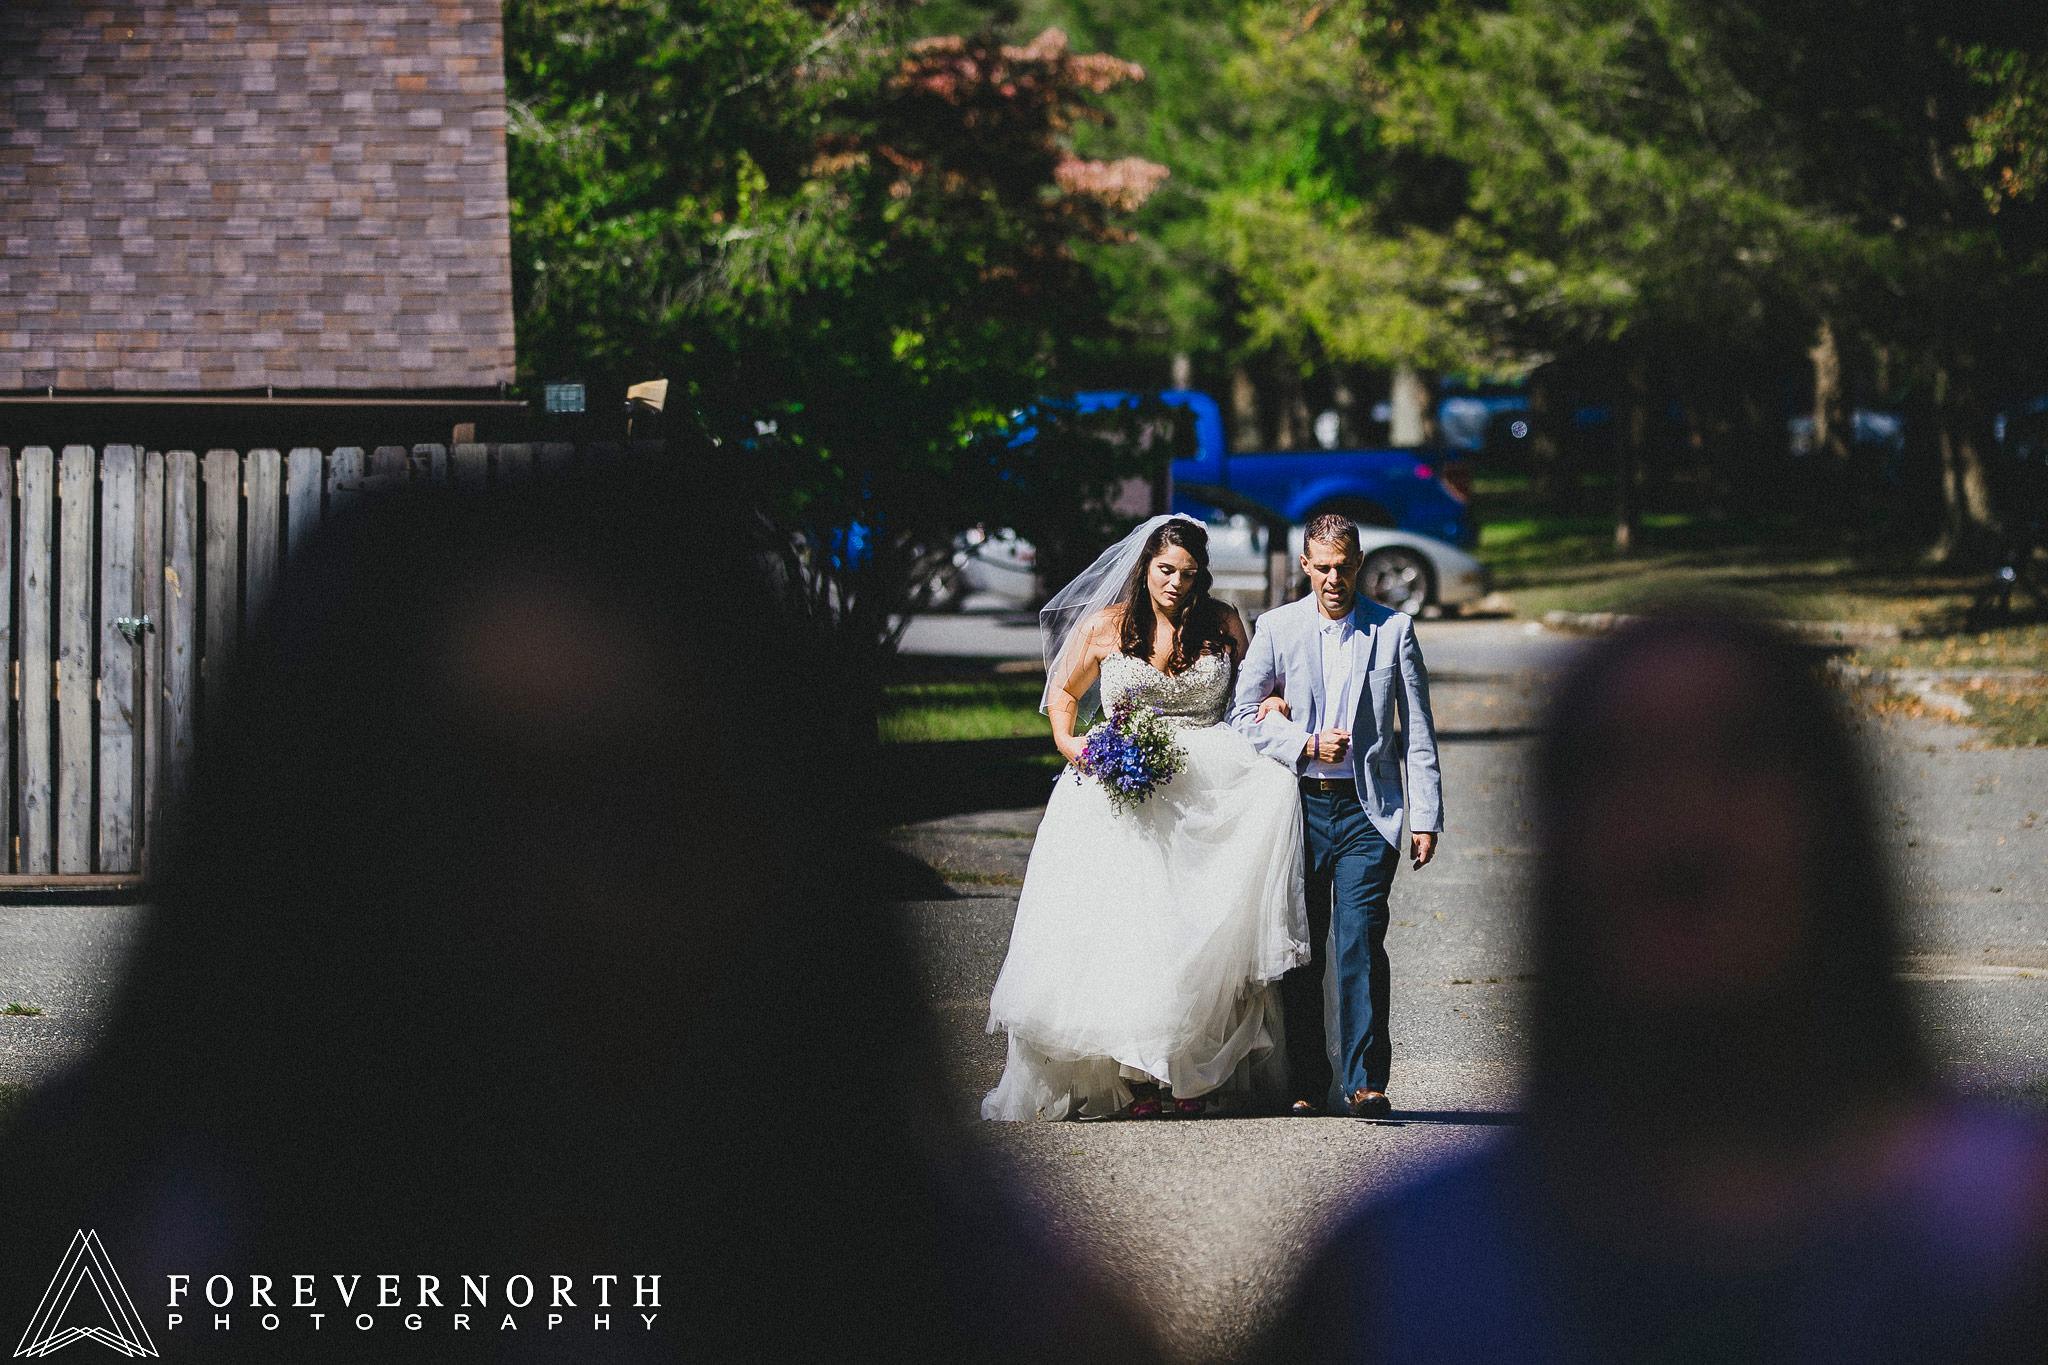 Brown-Allaire-State-Park-Wedding-Photographer-13.JPG